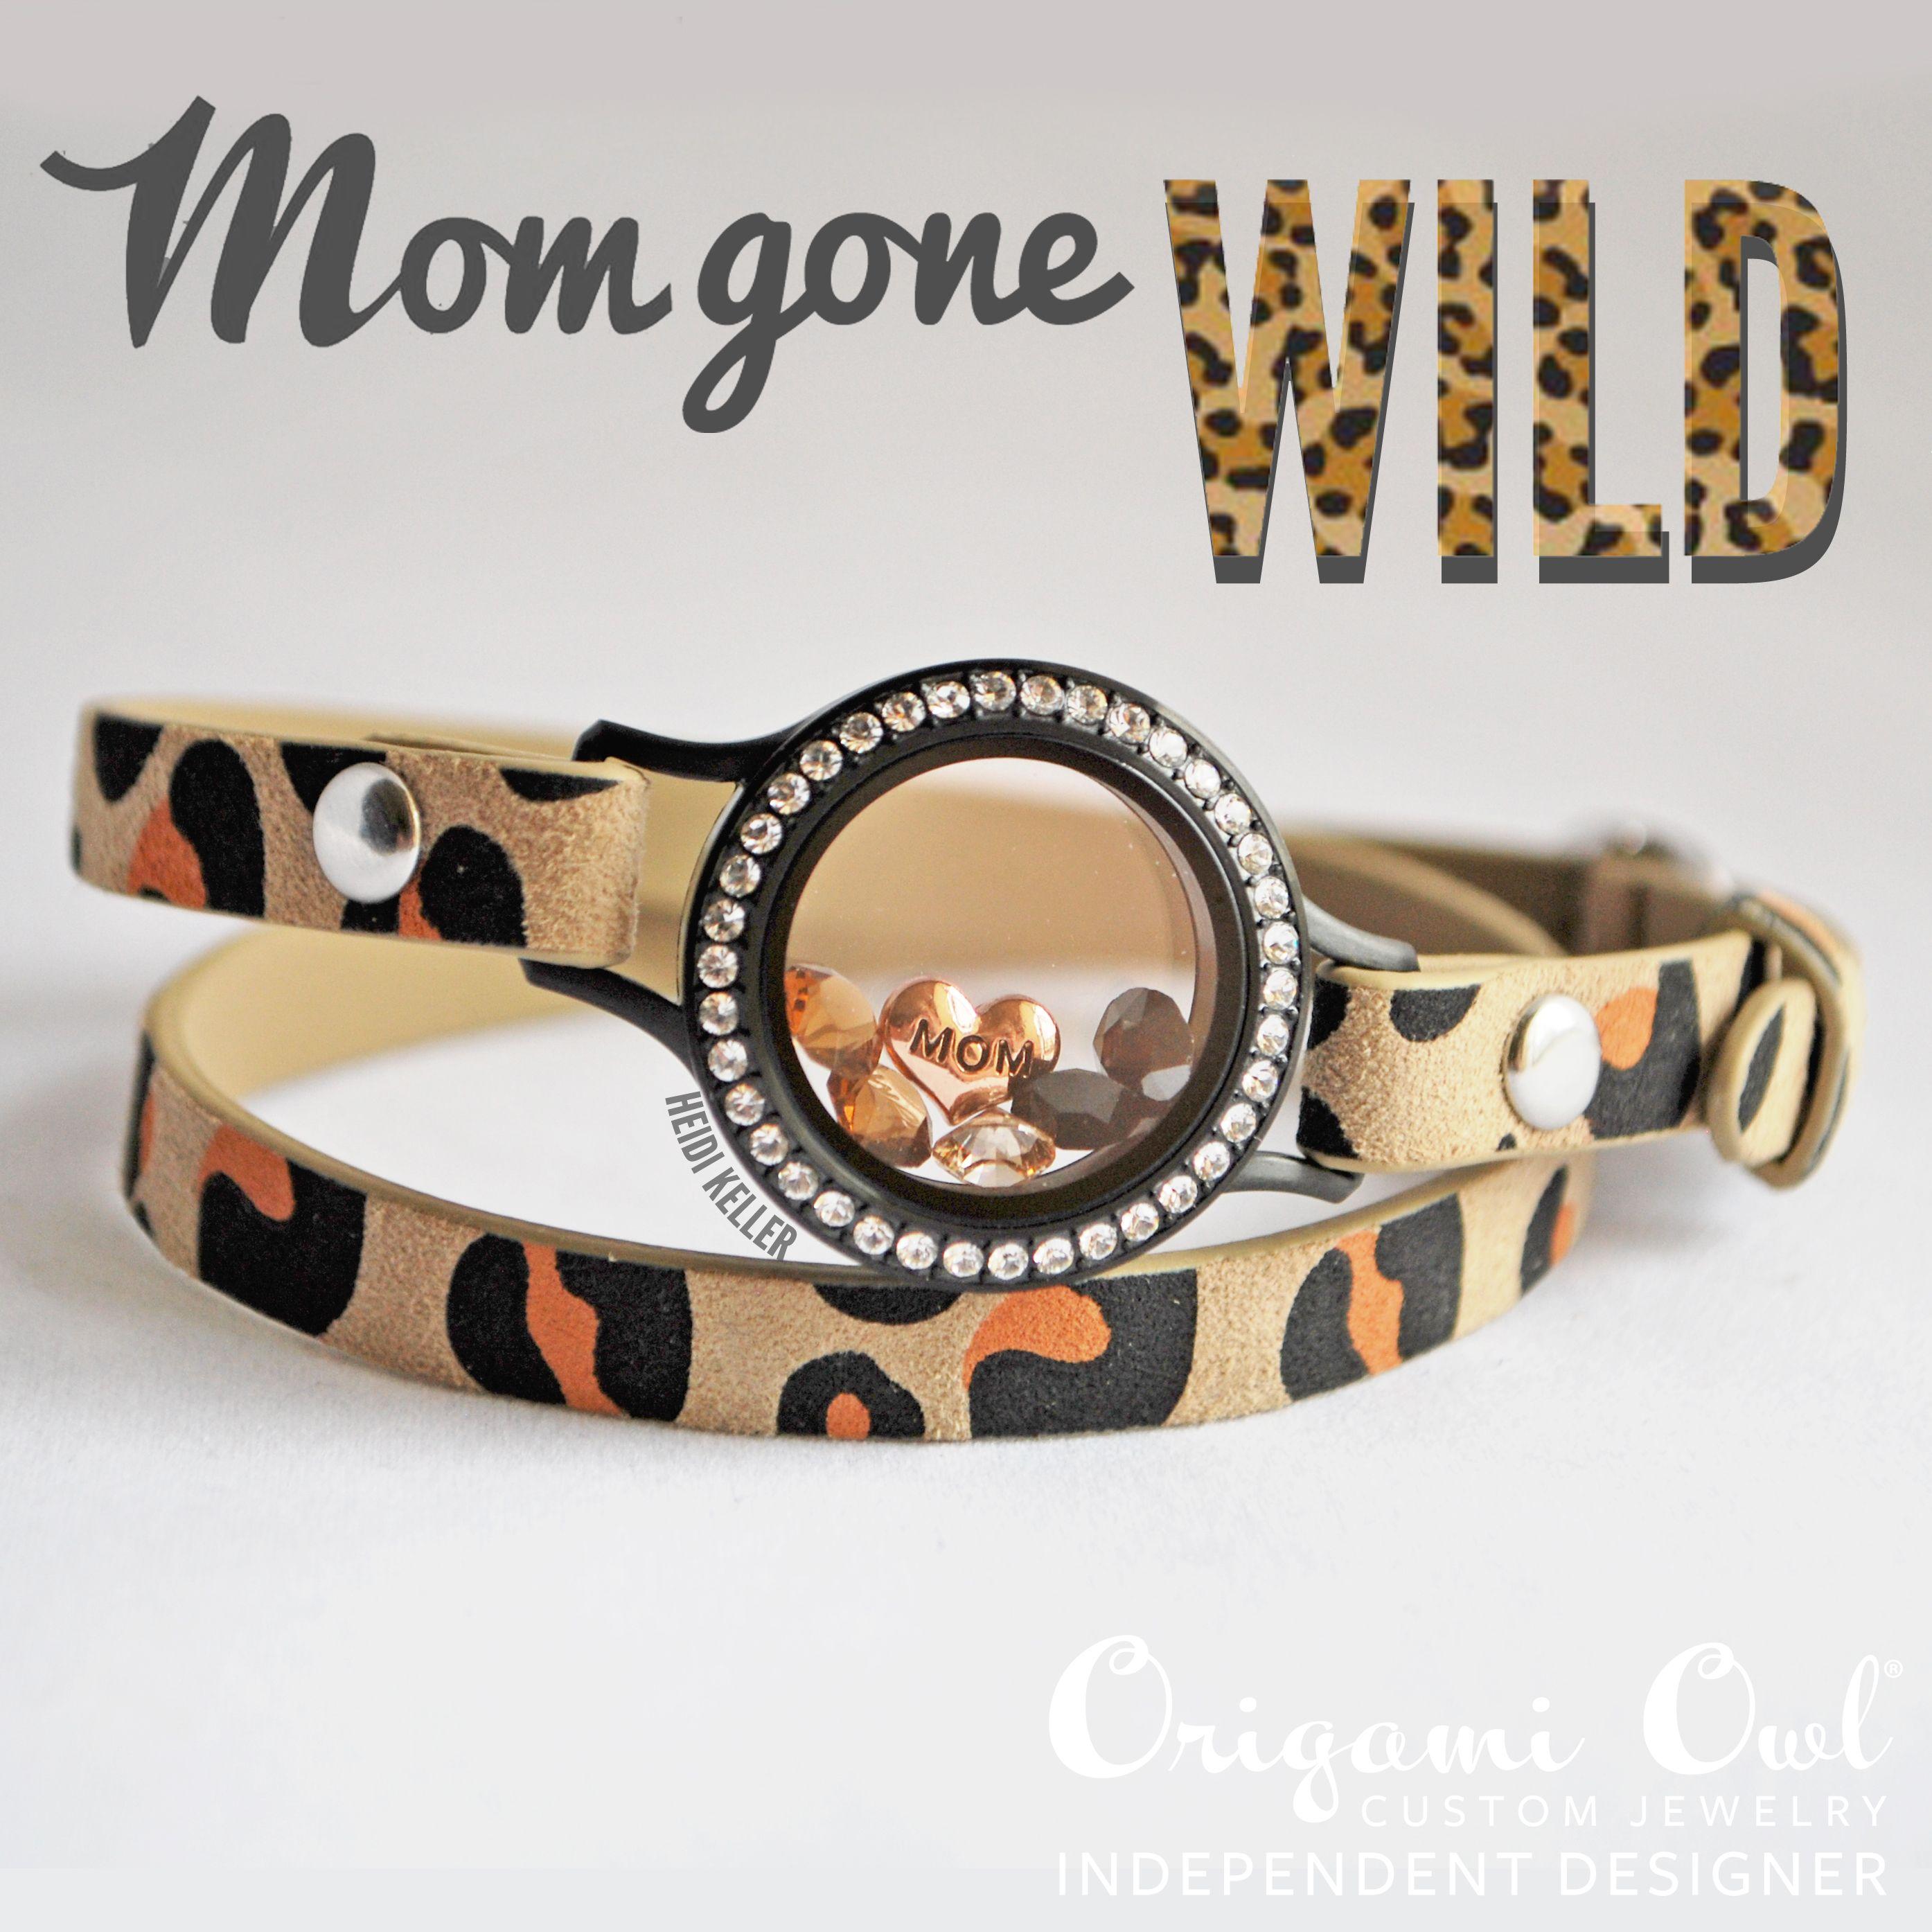 185 Best Origami Owl Bracelet Ideas images | Origami owl bracelet ... | 2789x2789